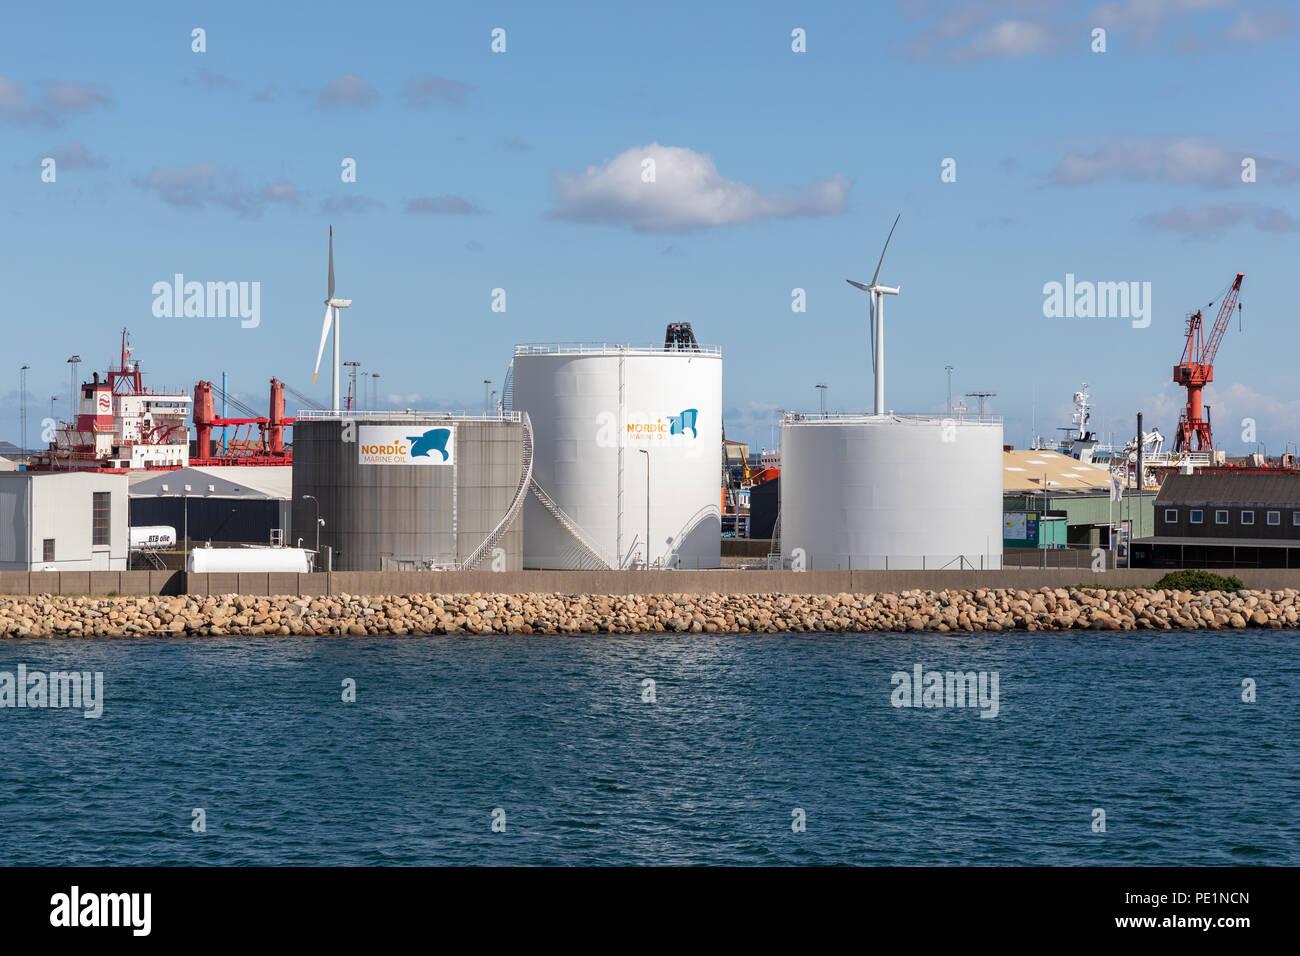 Nordic Marine Oil, Frederikshavn, Denmark Stock Photo